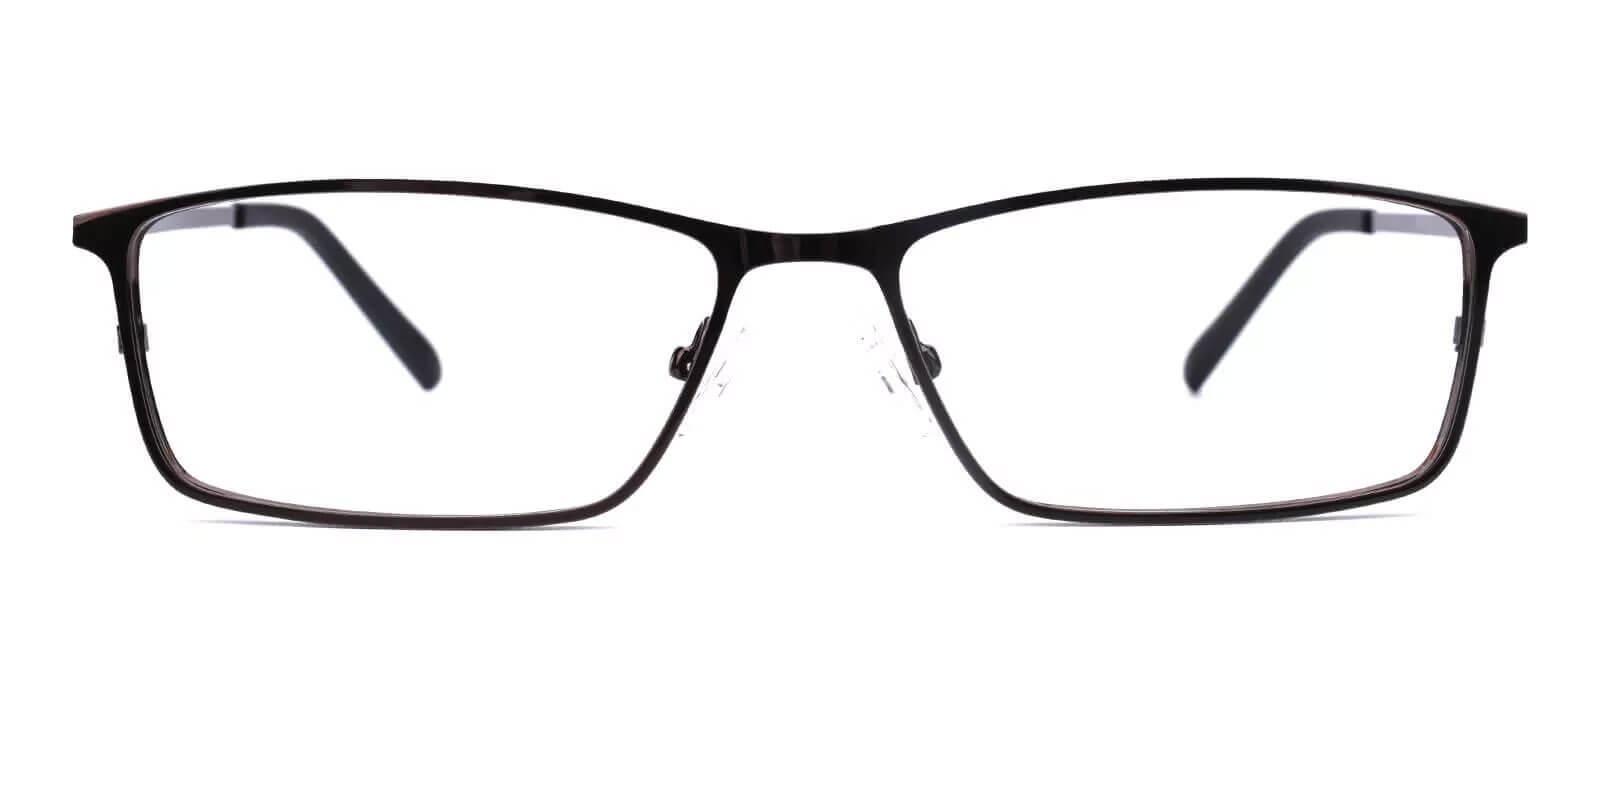 Wildersville Brown Metal Eyeglasses , NosePads Frames from ABBE Glasses